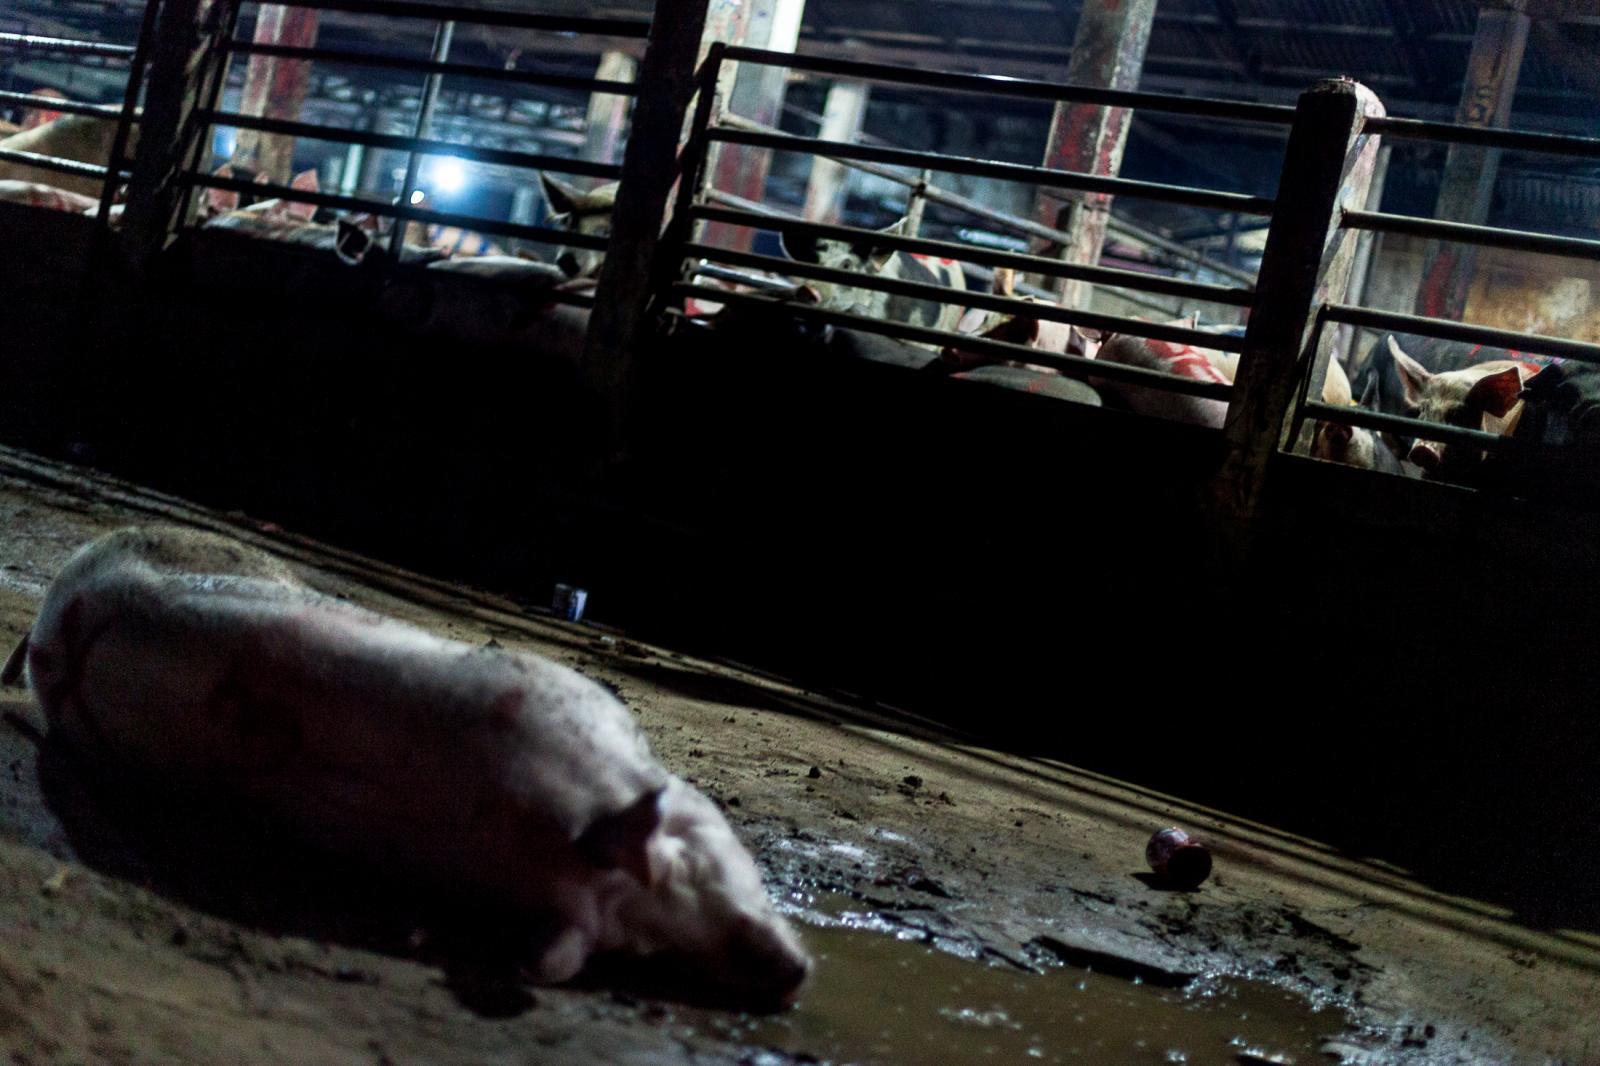 Photography image - Loading 002_Slaughterhouse-Cambodia-Omar-Havana.jpg